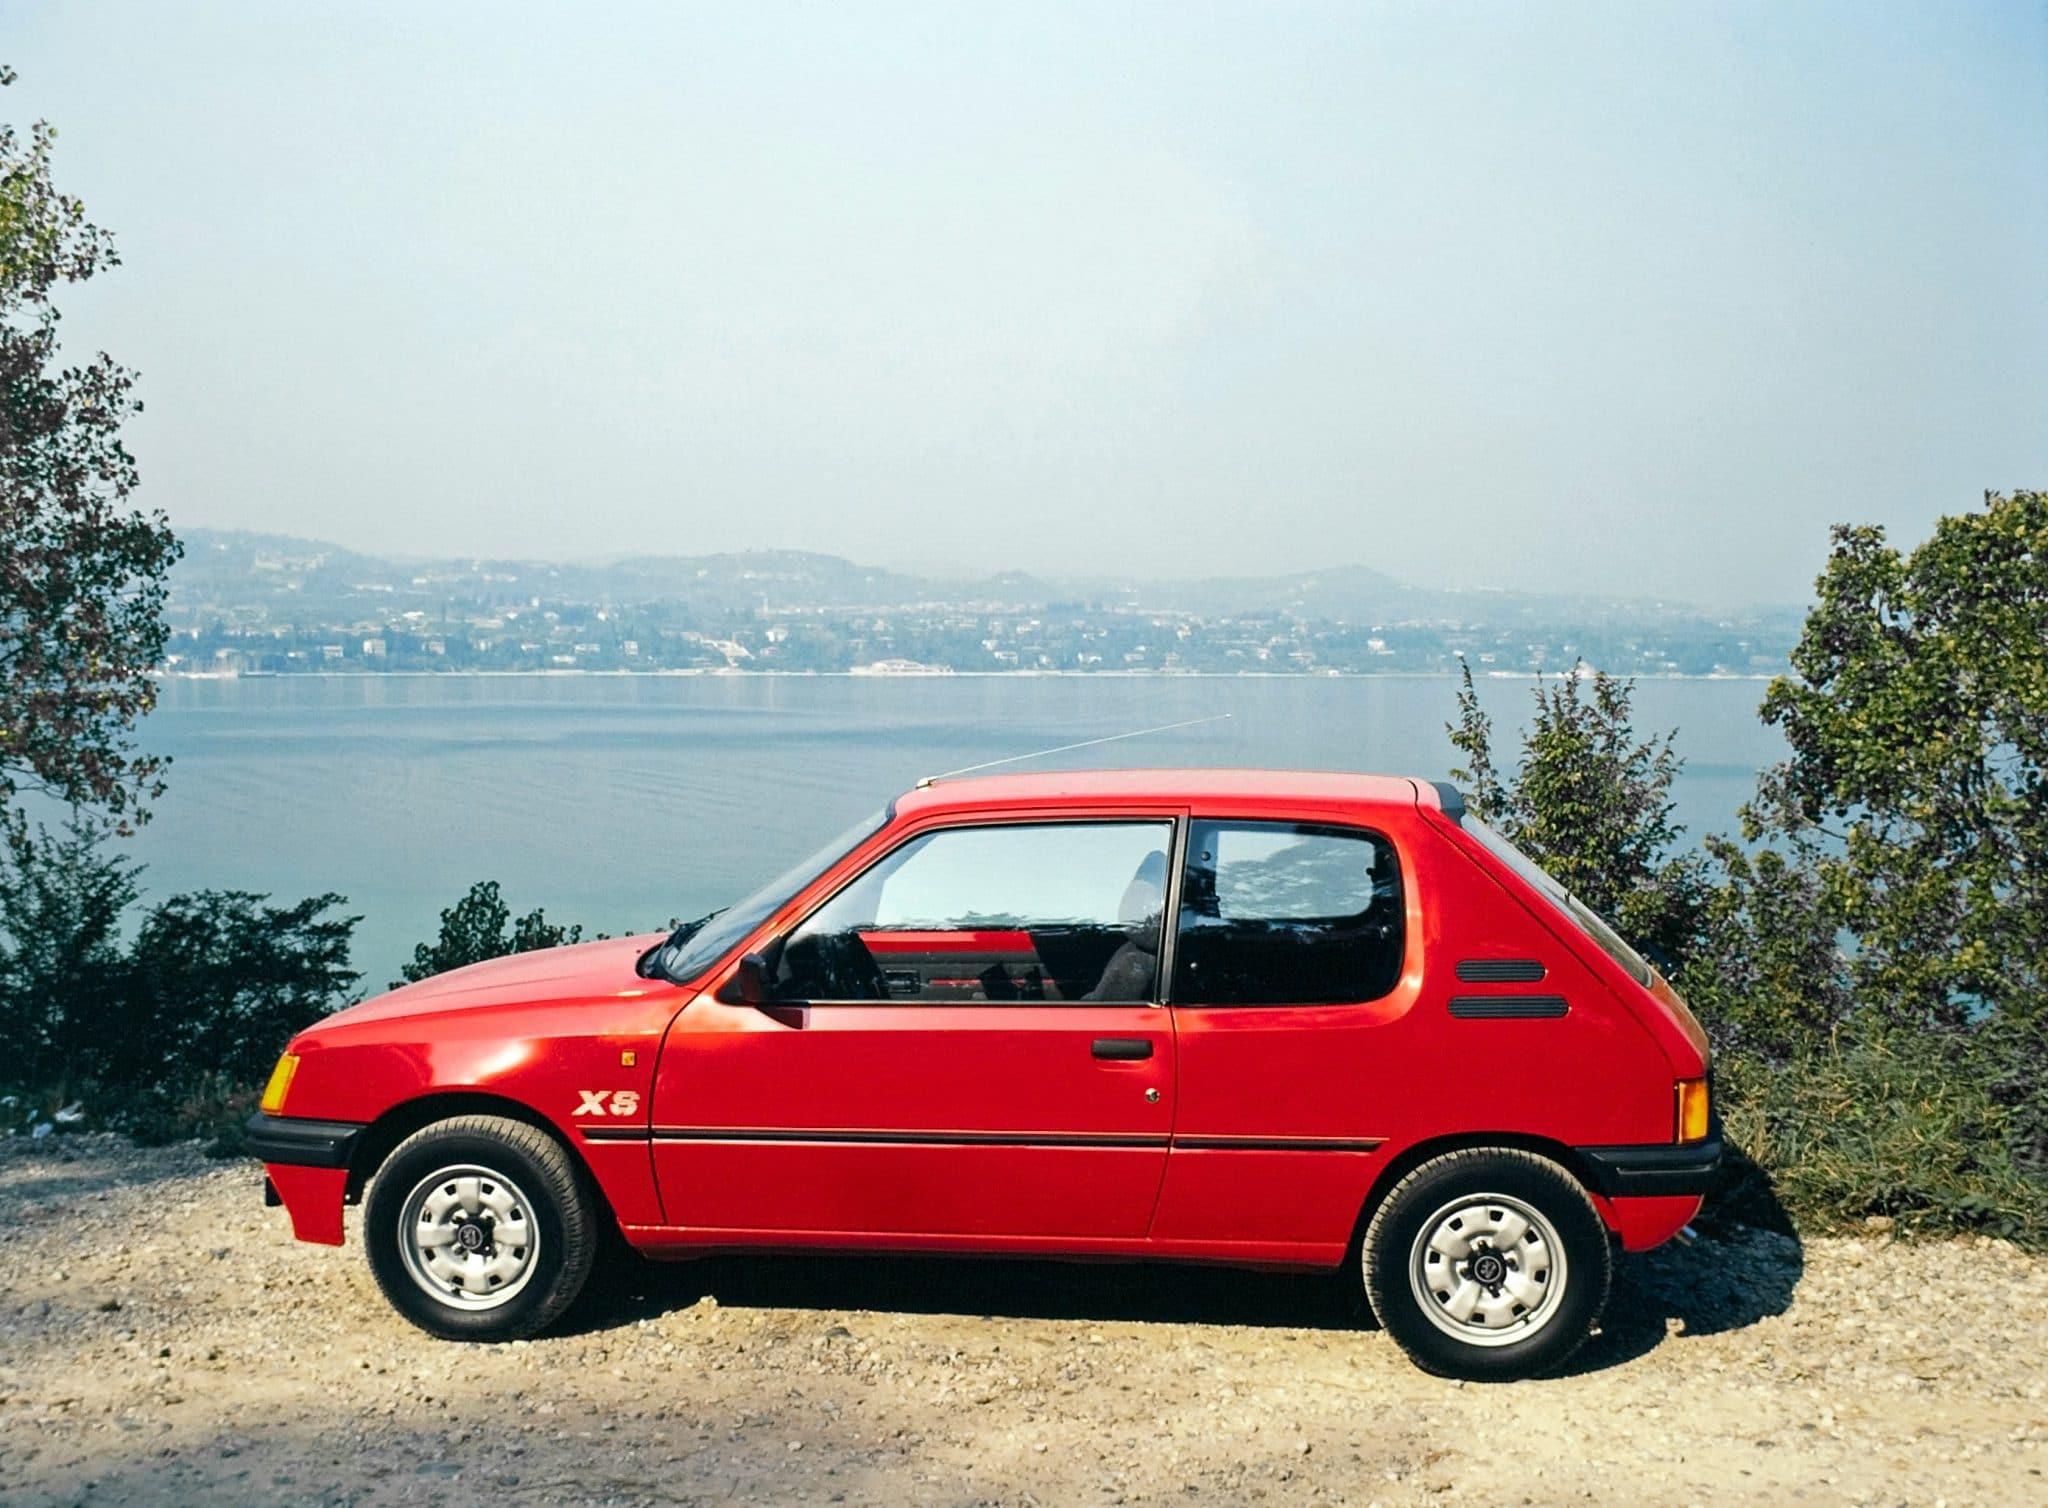 Peugeot 205 XS 1.4